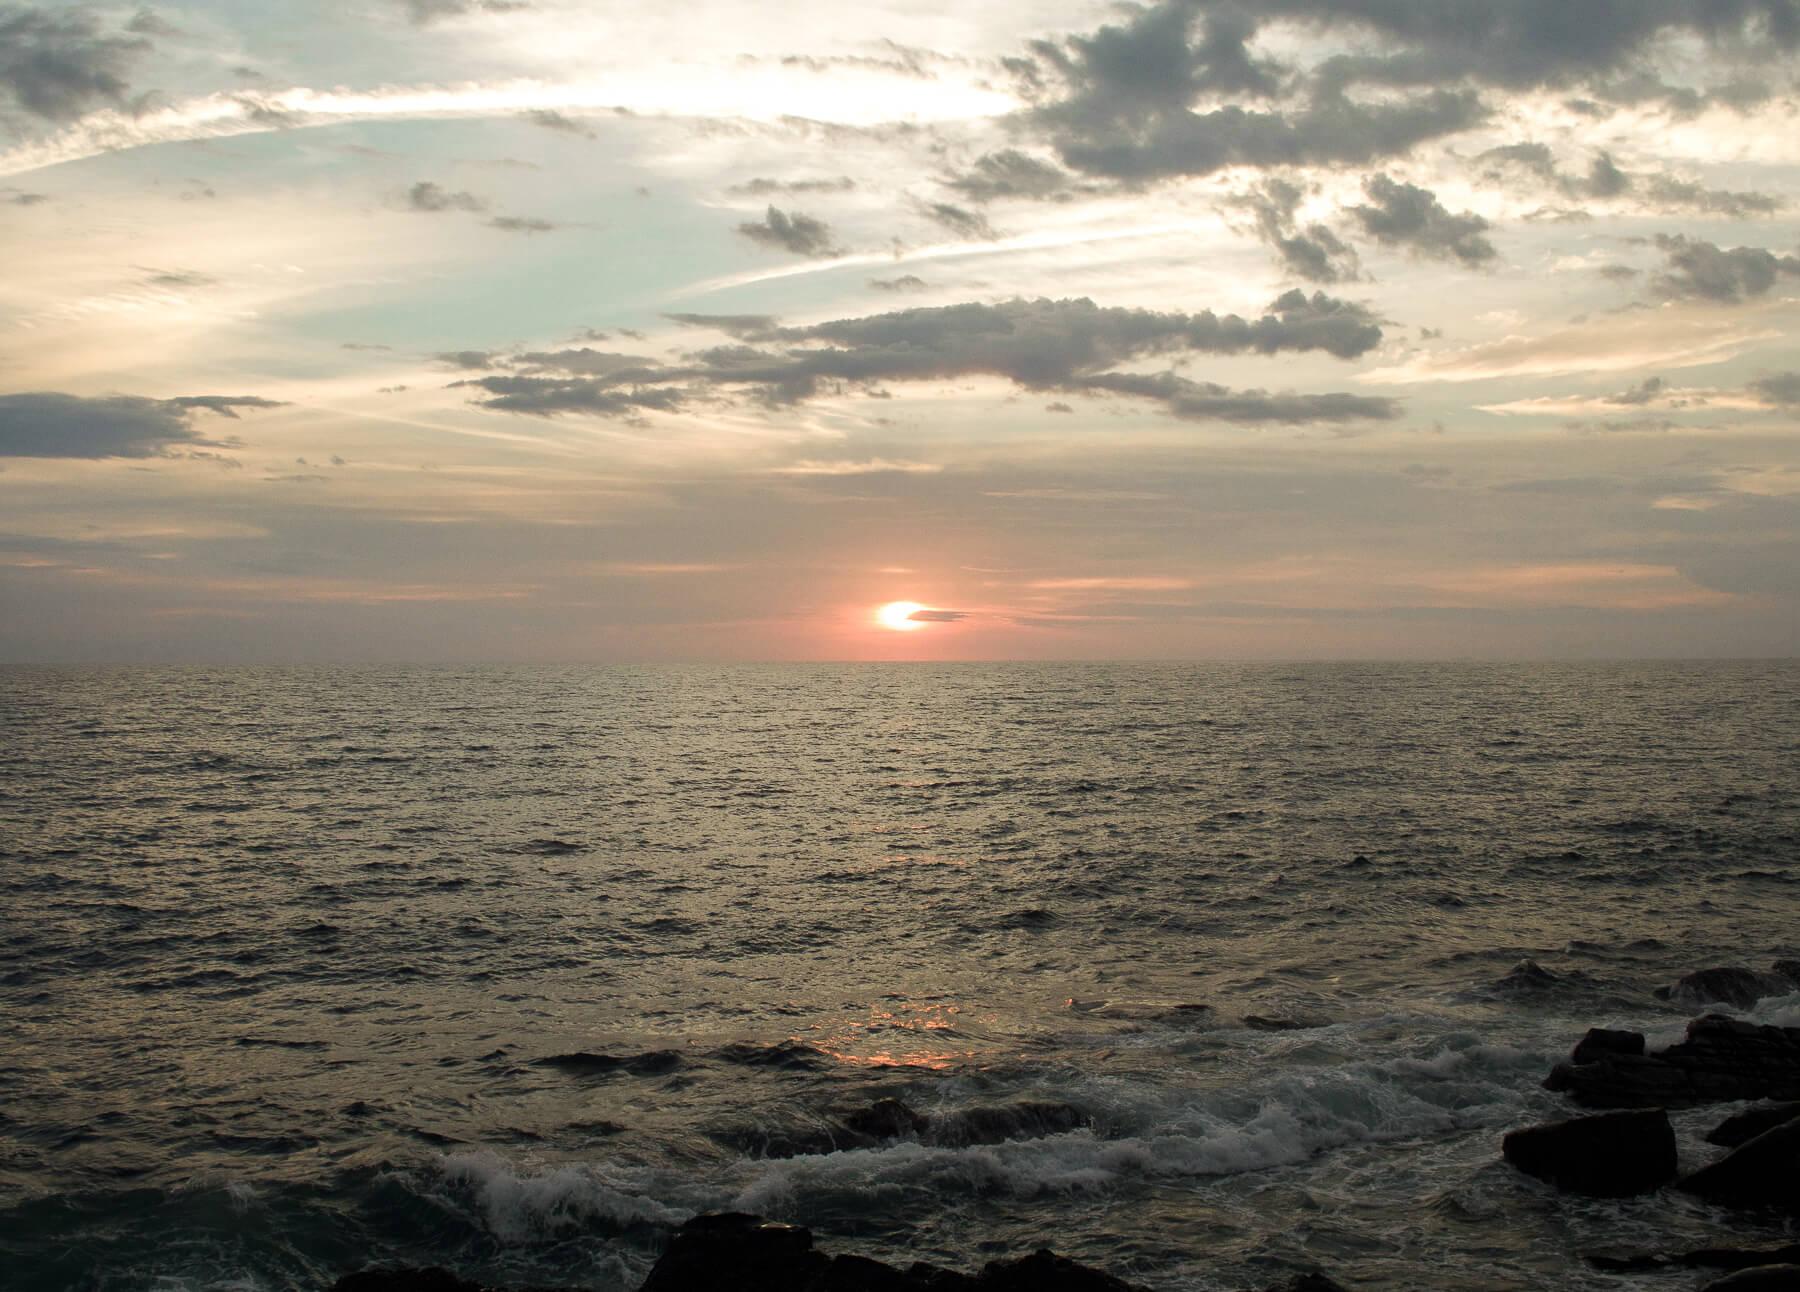 Sun setting behind the ocean in Borneo